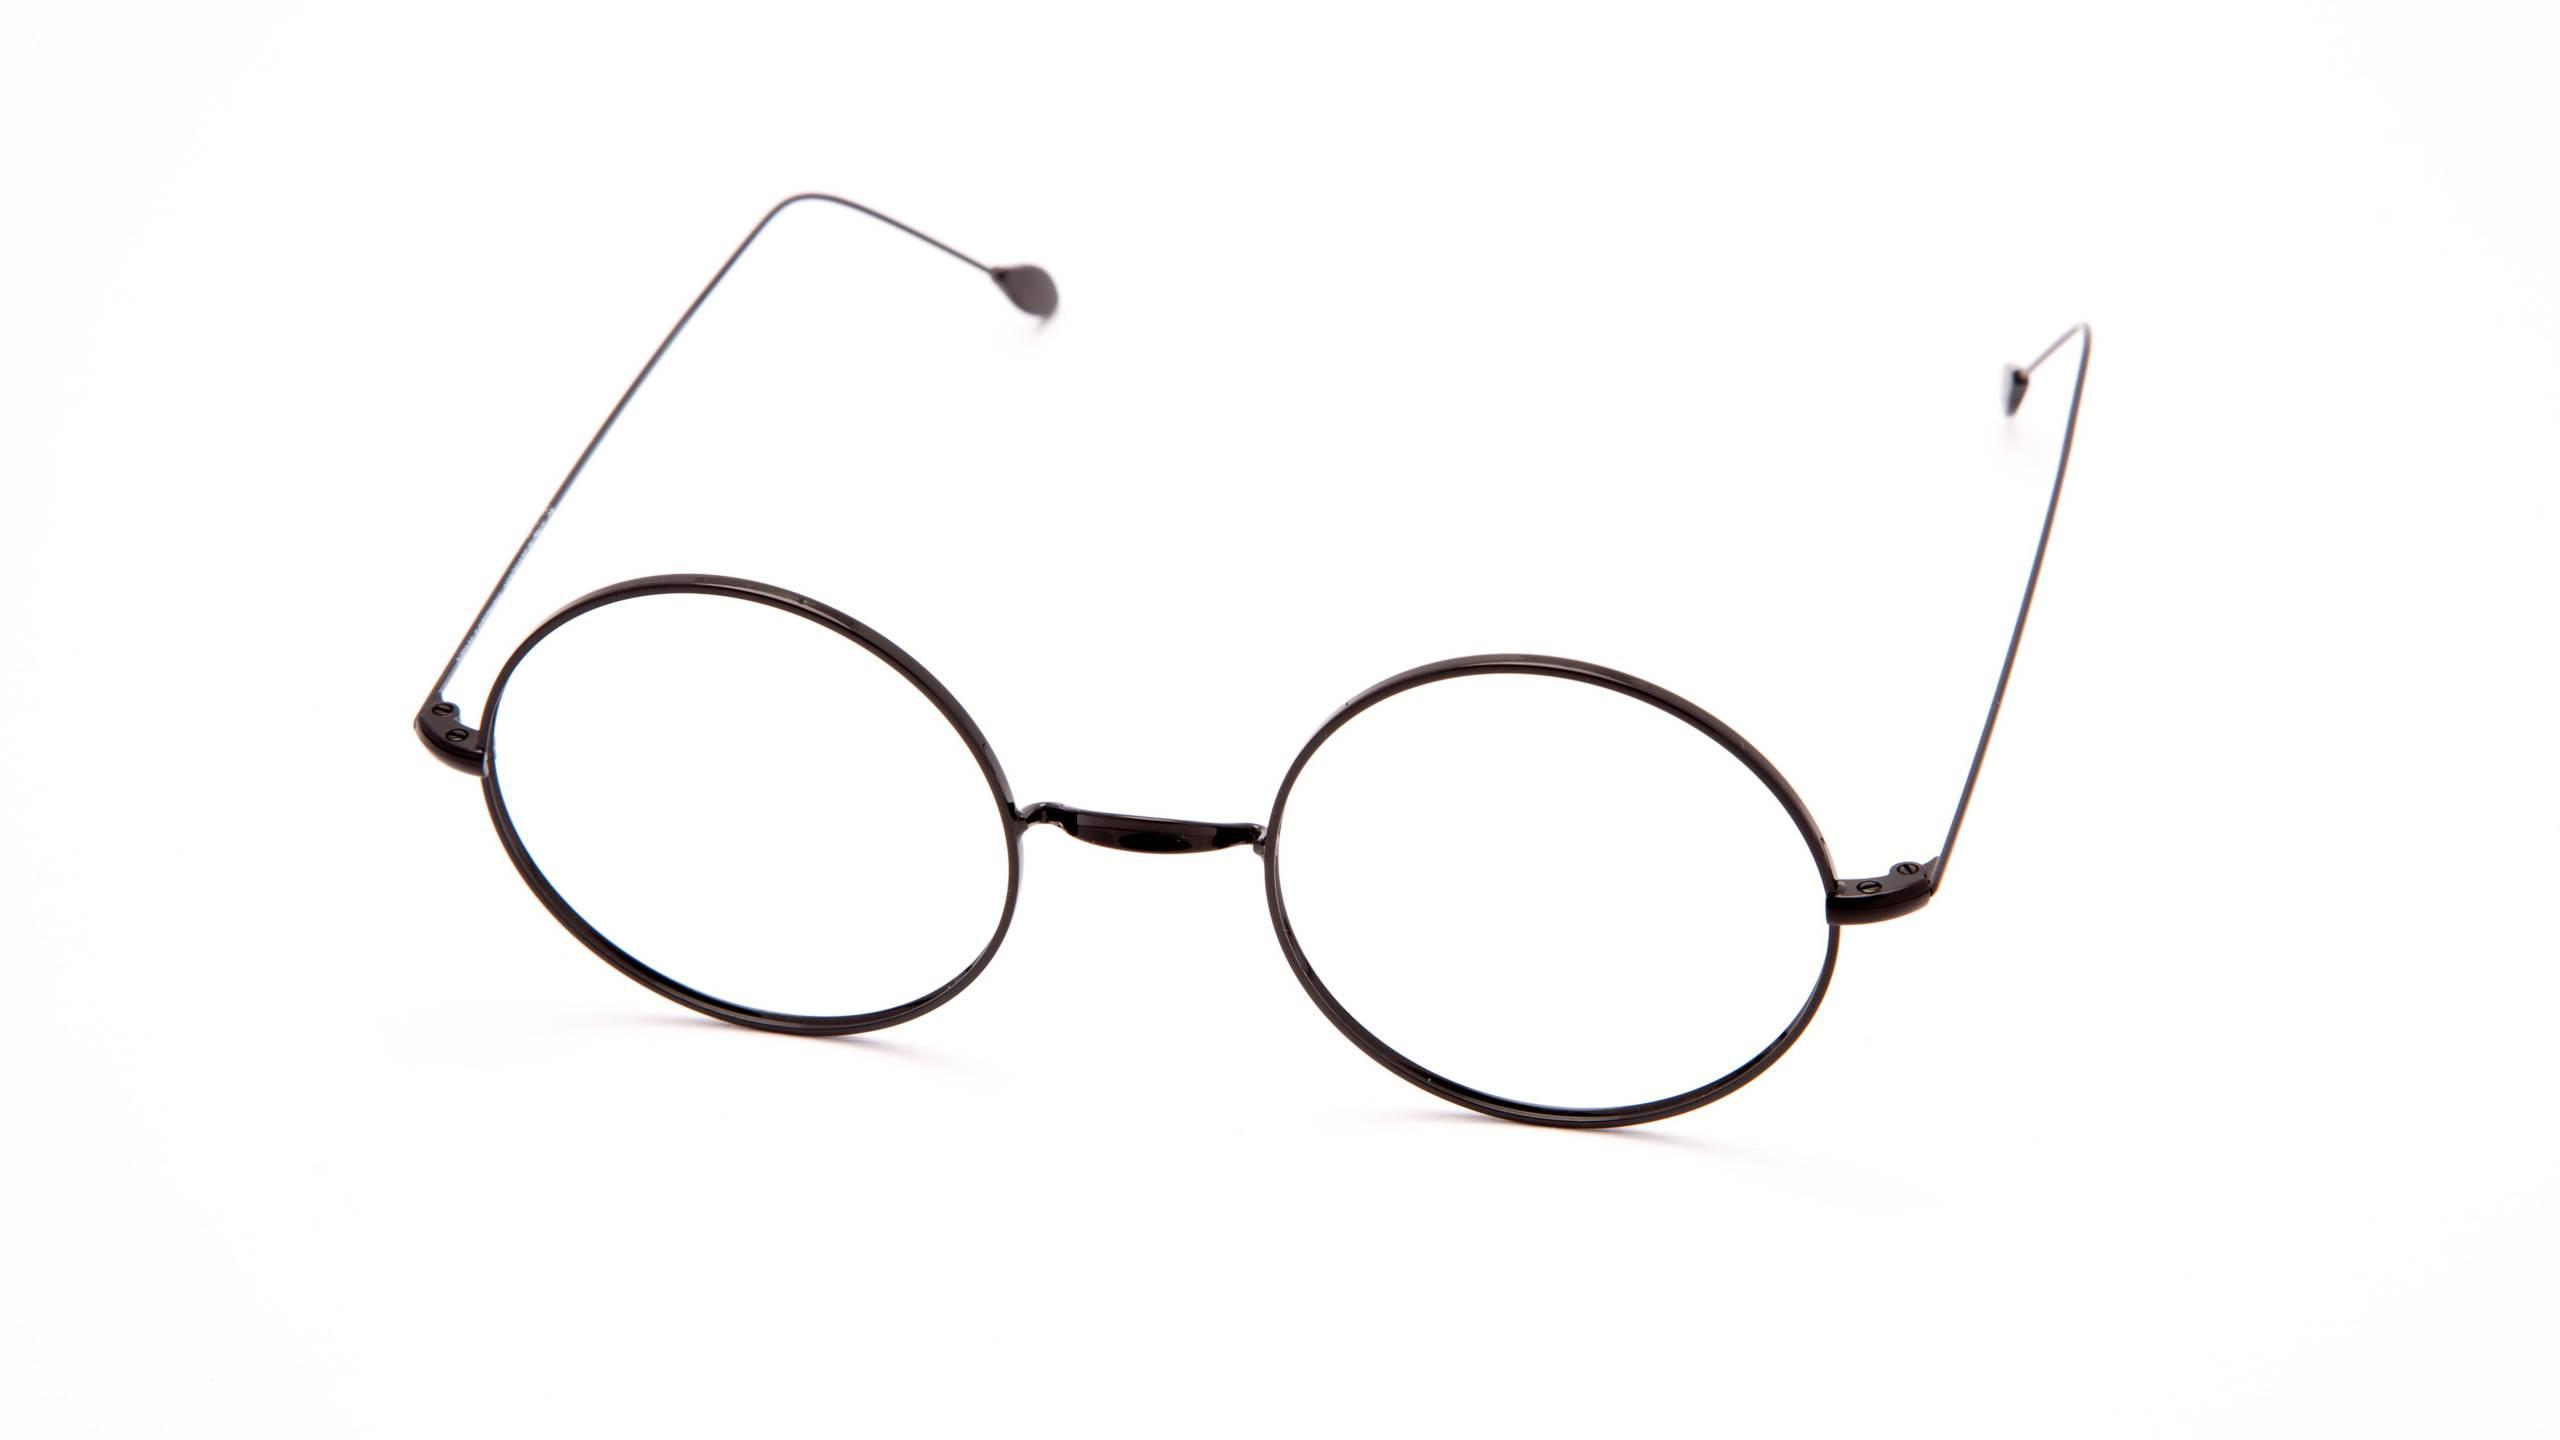 eyeglasses-Nathan-Kaltermann-made-in-Italy-PORTOFINO-NERO-UNI-VISTA2